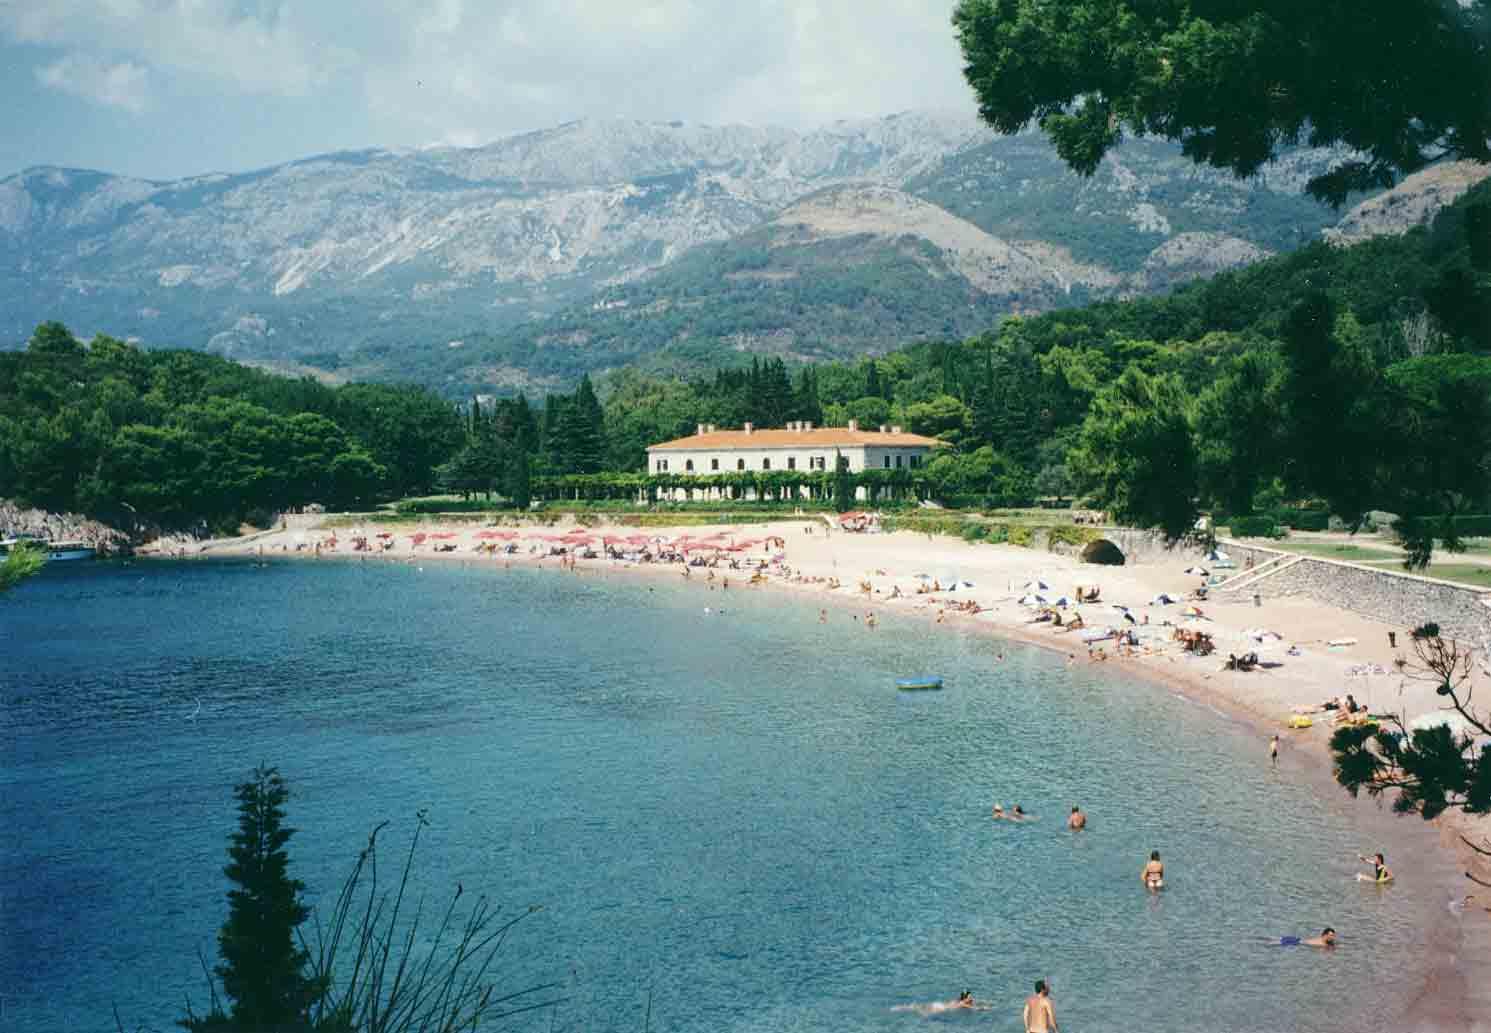 Milocer Montenegro  city pictures gallery : Badestrand bei Sv. Stefan Sveti Stefan Montenegro, Crna Gora